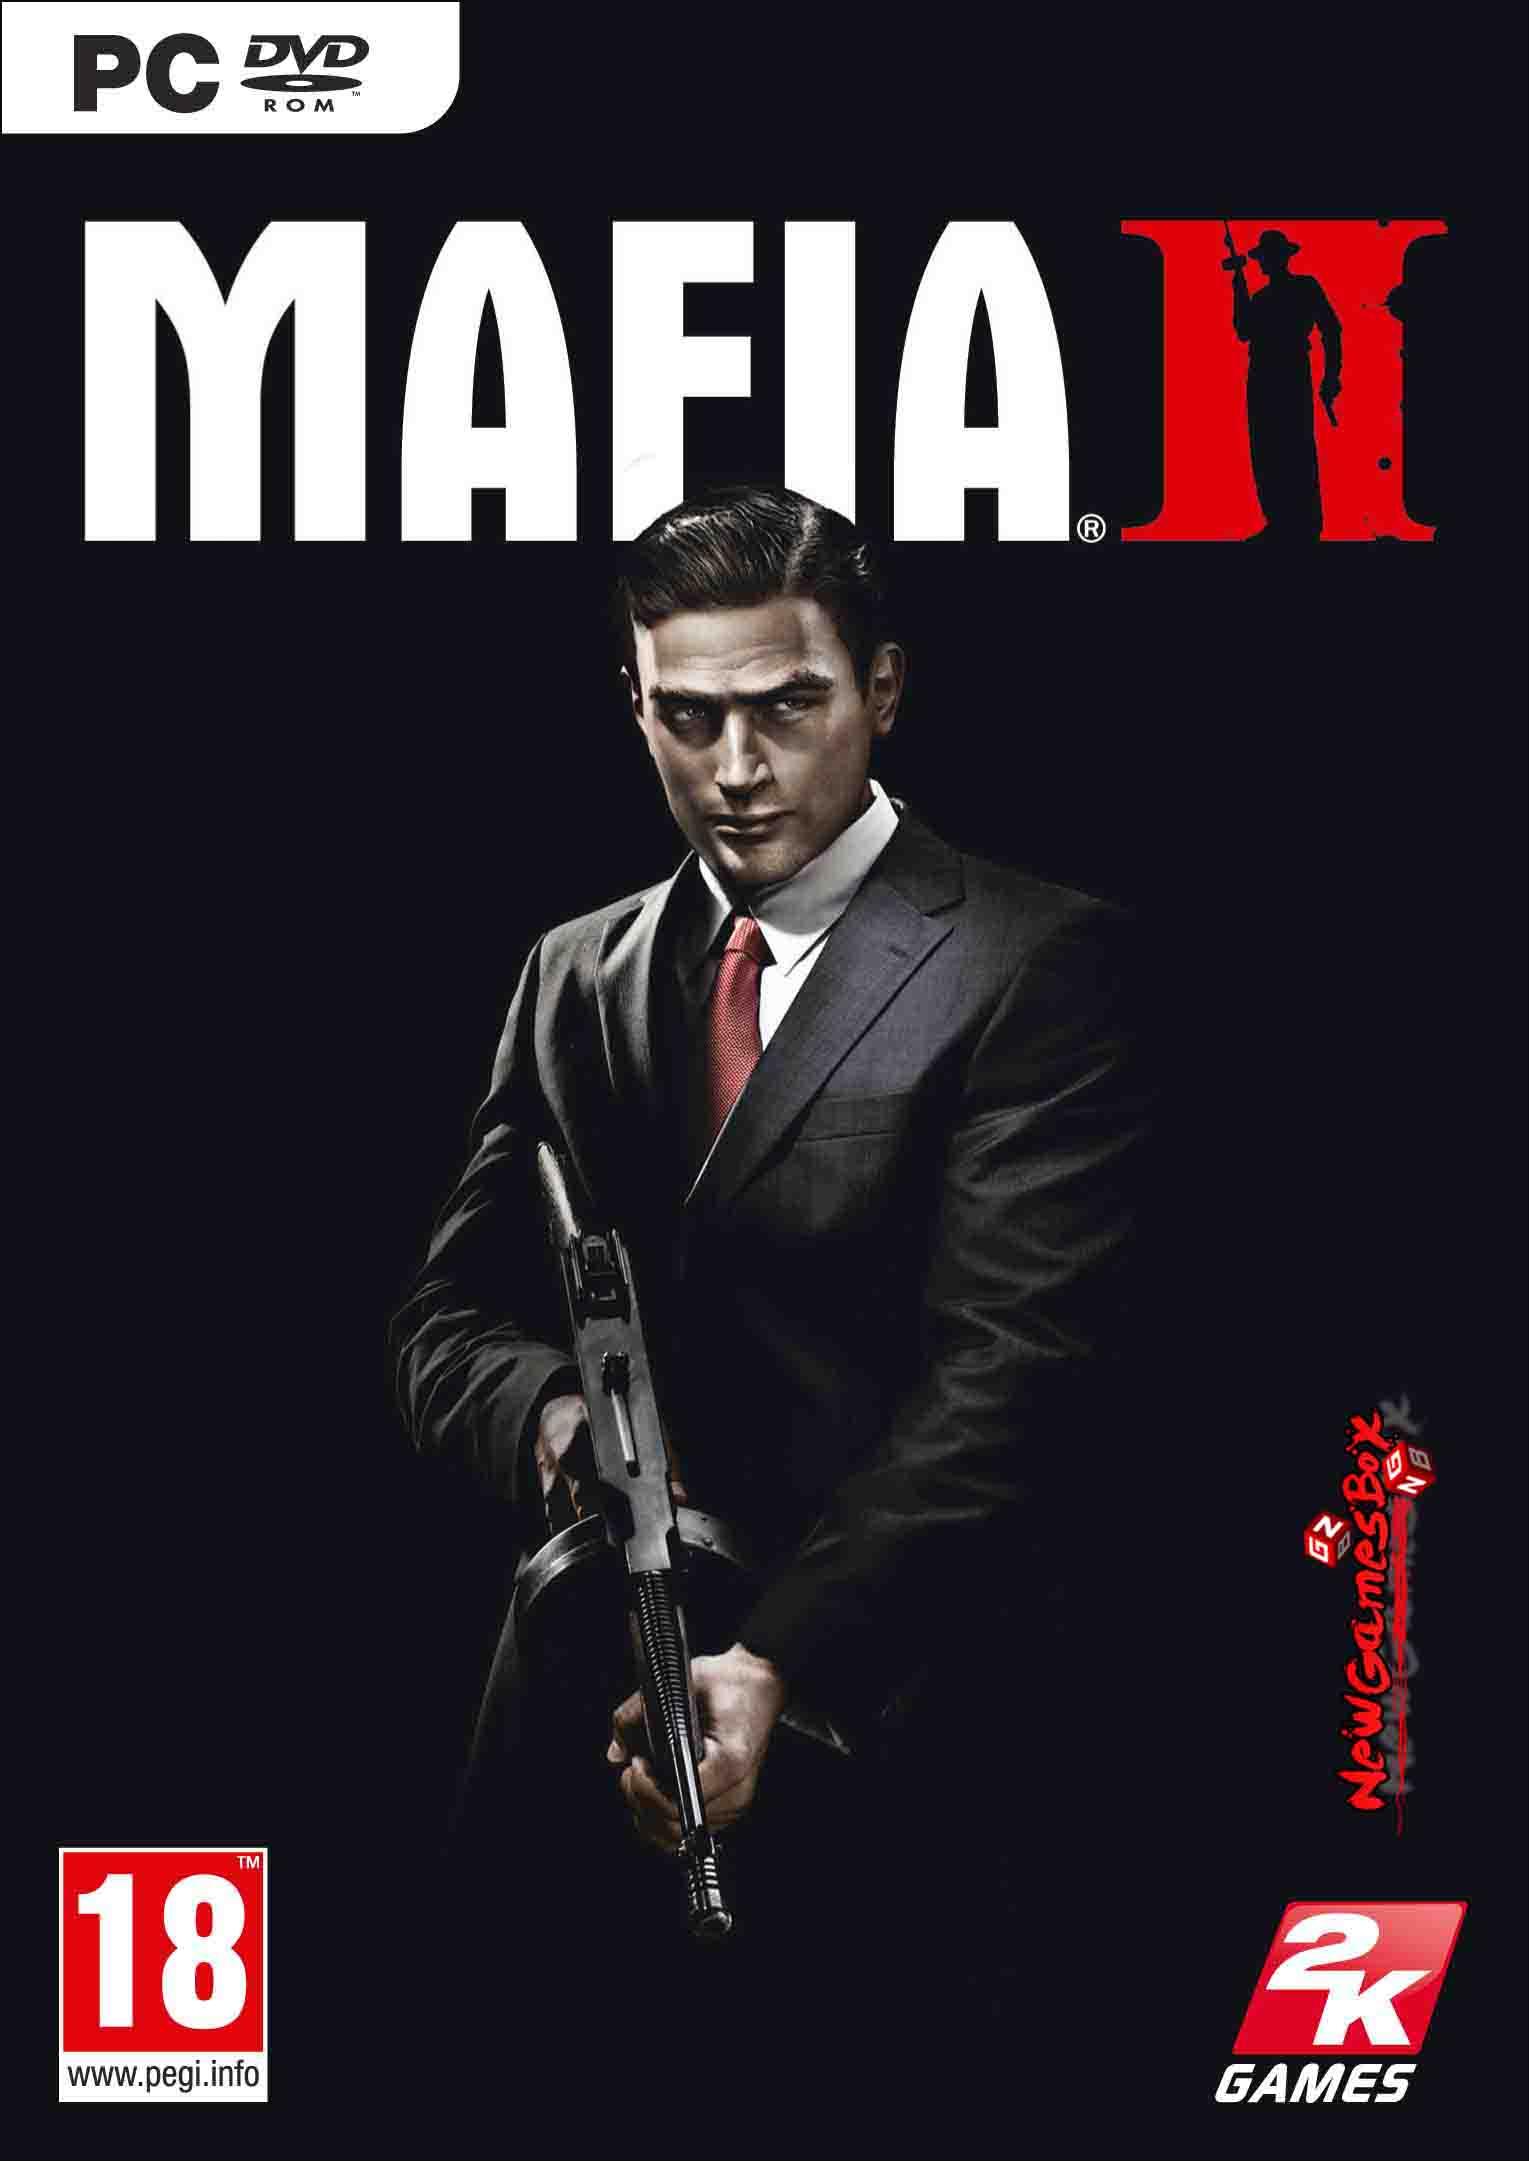 Mafia ii complete free download full version pc setup - How to download mafia 2 ...